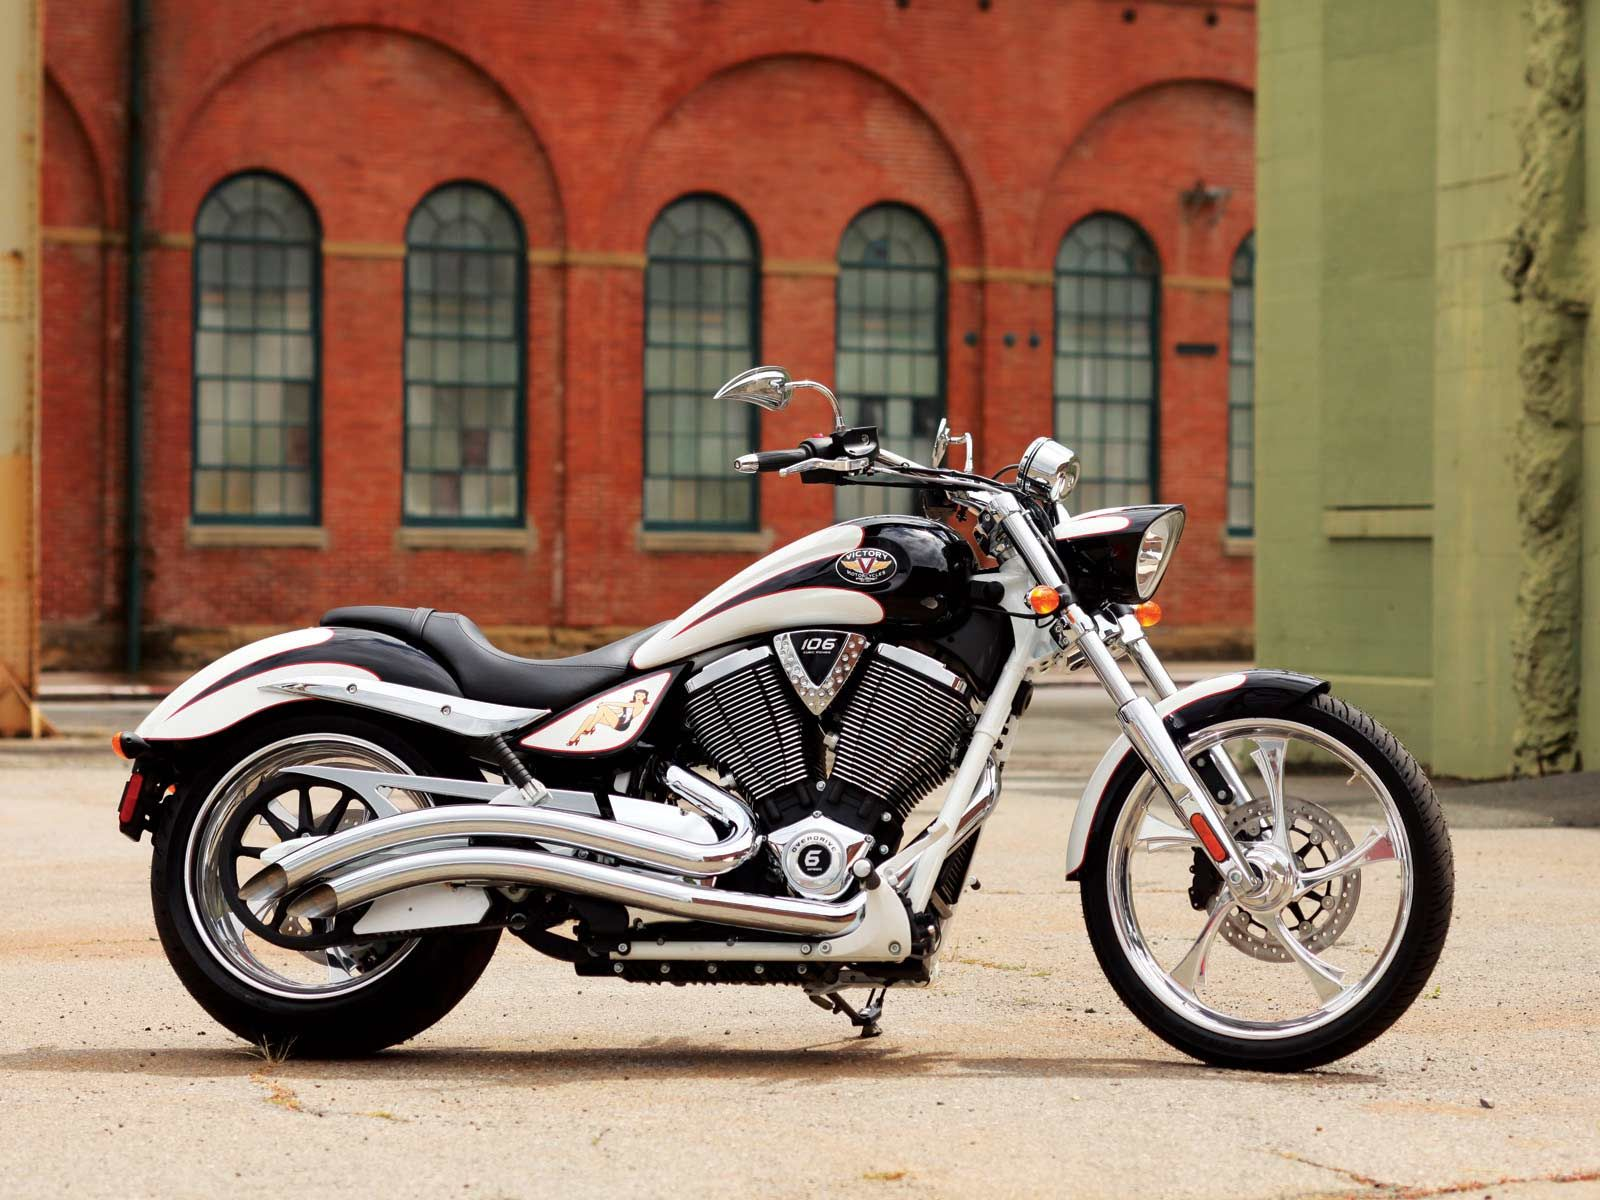 Victory Vegas Jackpot Black White Victory Motorcycles Victory Motorcycle Motorcycle